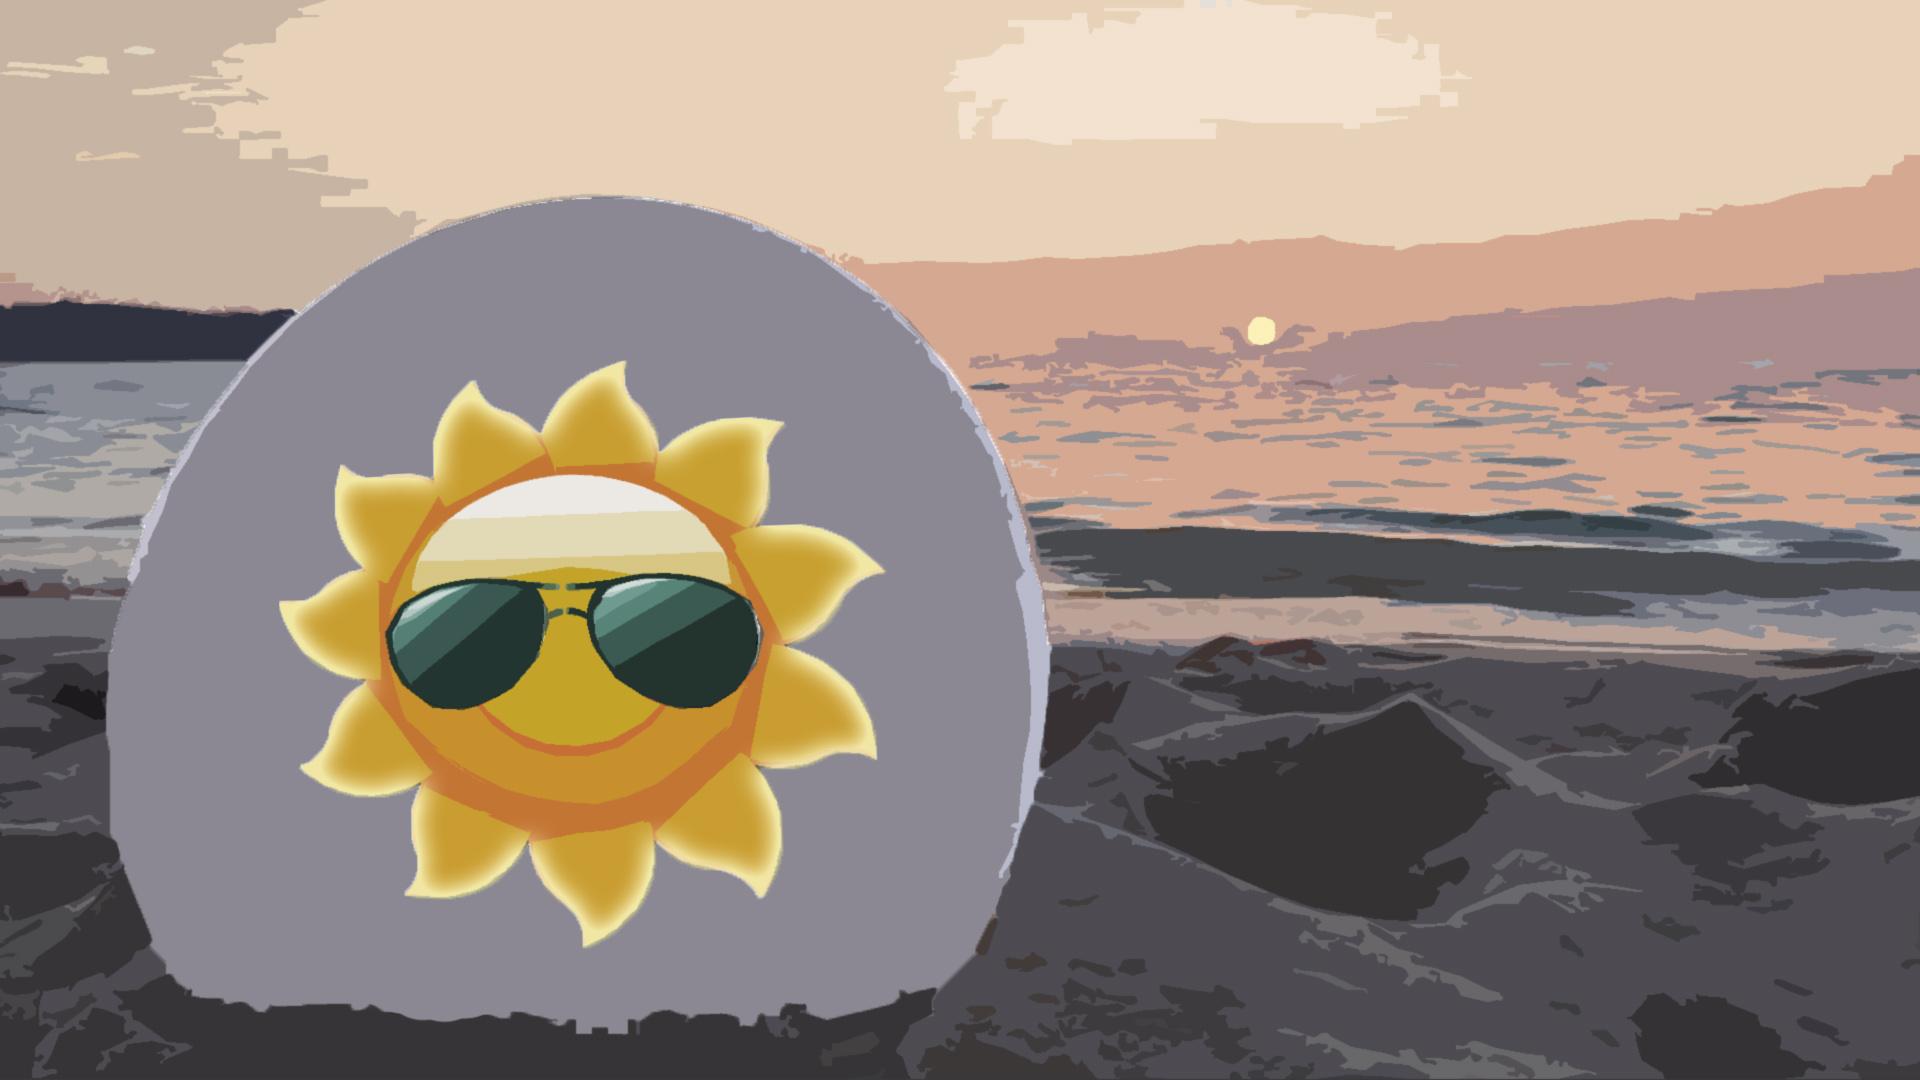 Dunes & Discs: Beach Ulimate